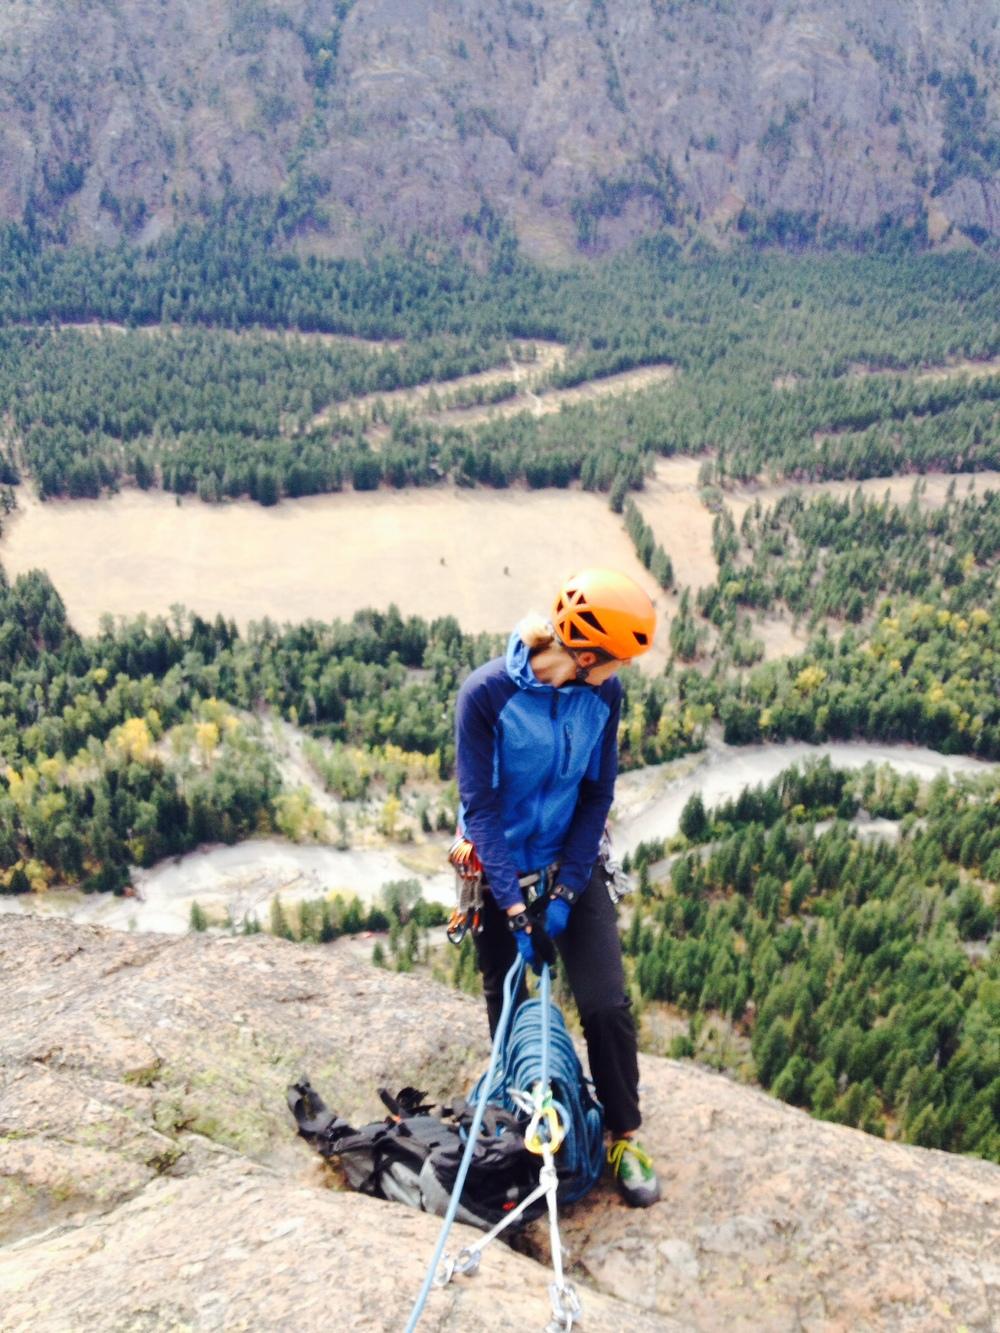 rock guiding, seven weeks pregnant, cr. J. Hoch